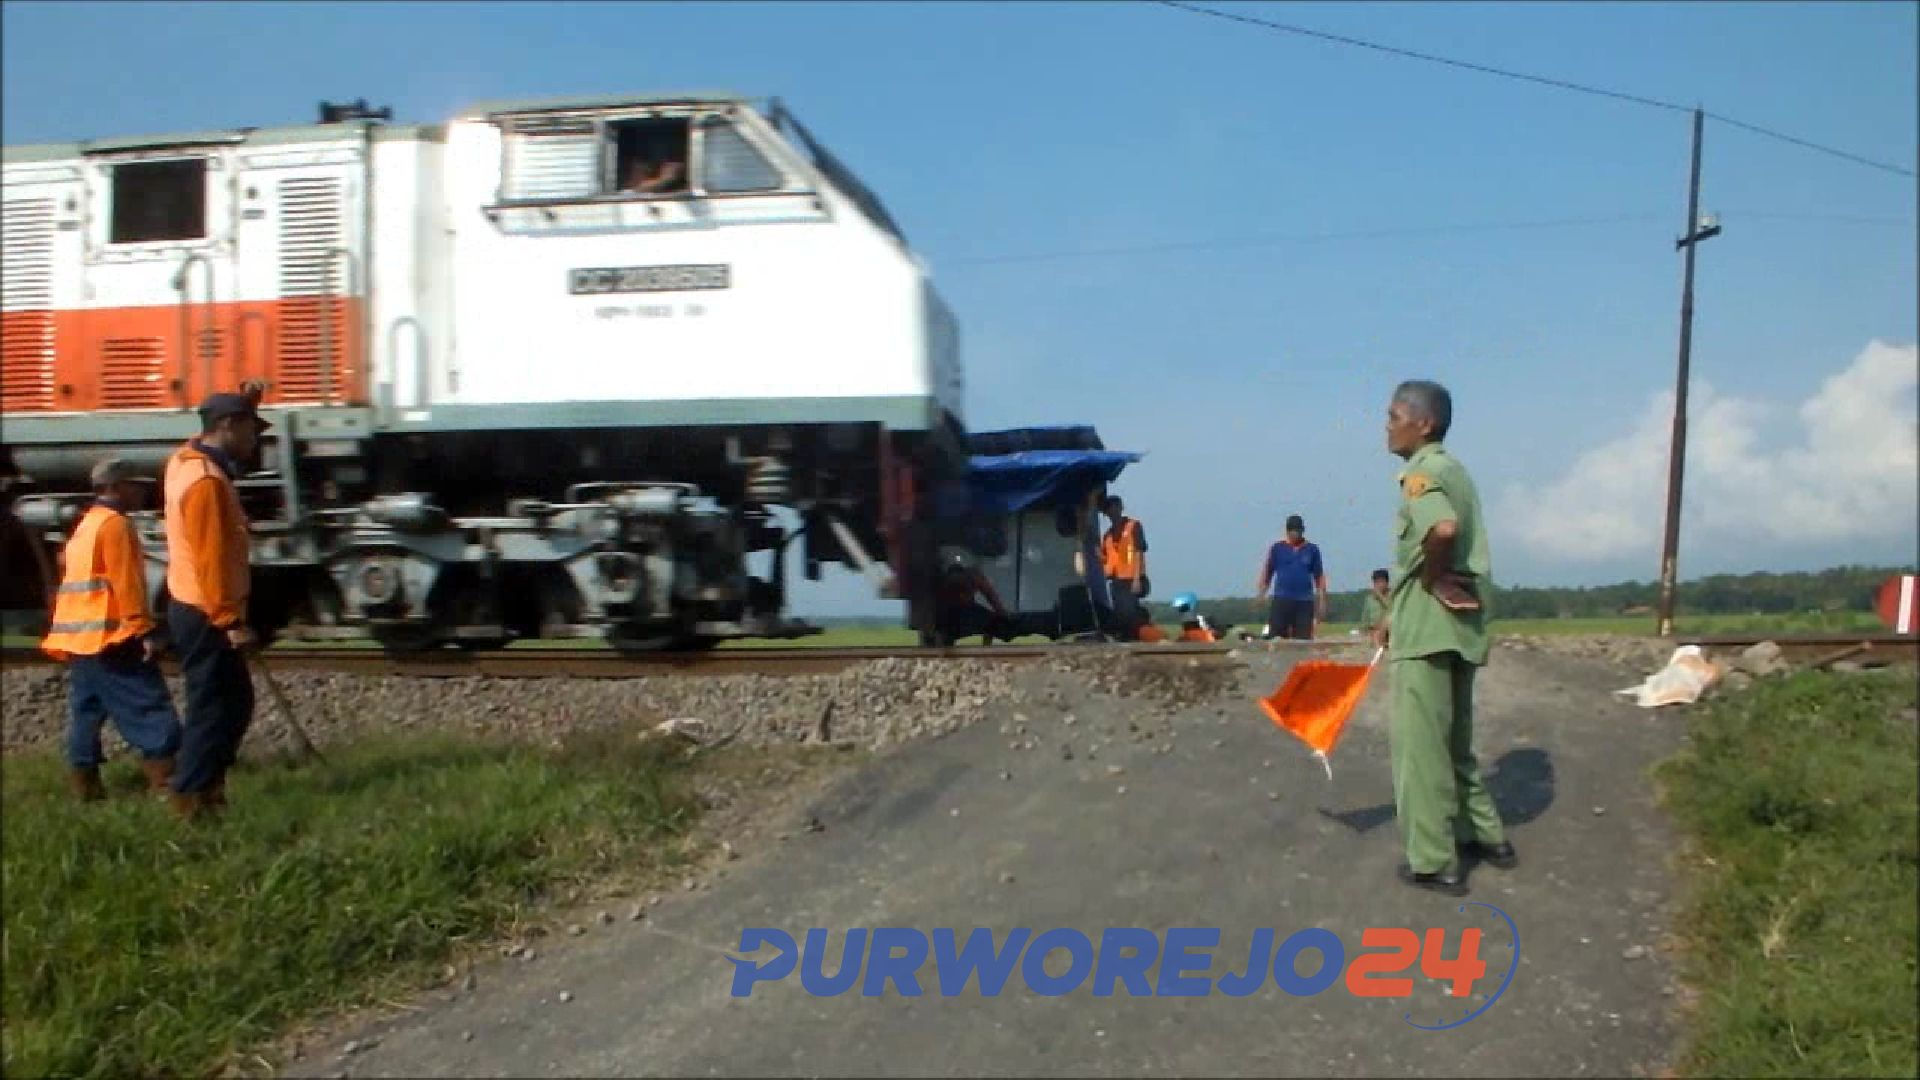 Kereta melintas di perlintasan tanpa palang pintu. (Ilustrasi)